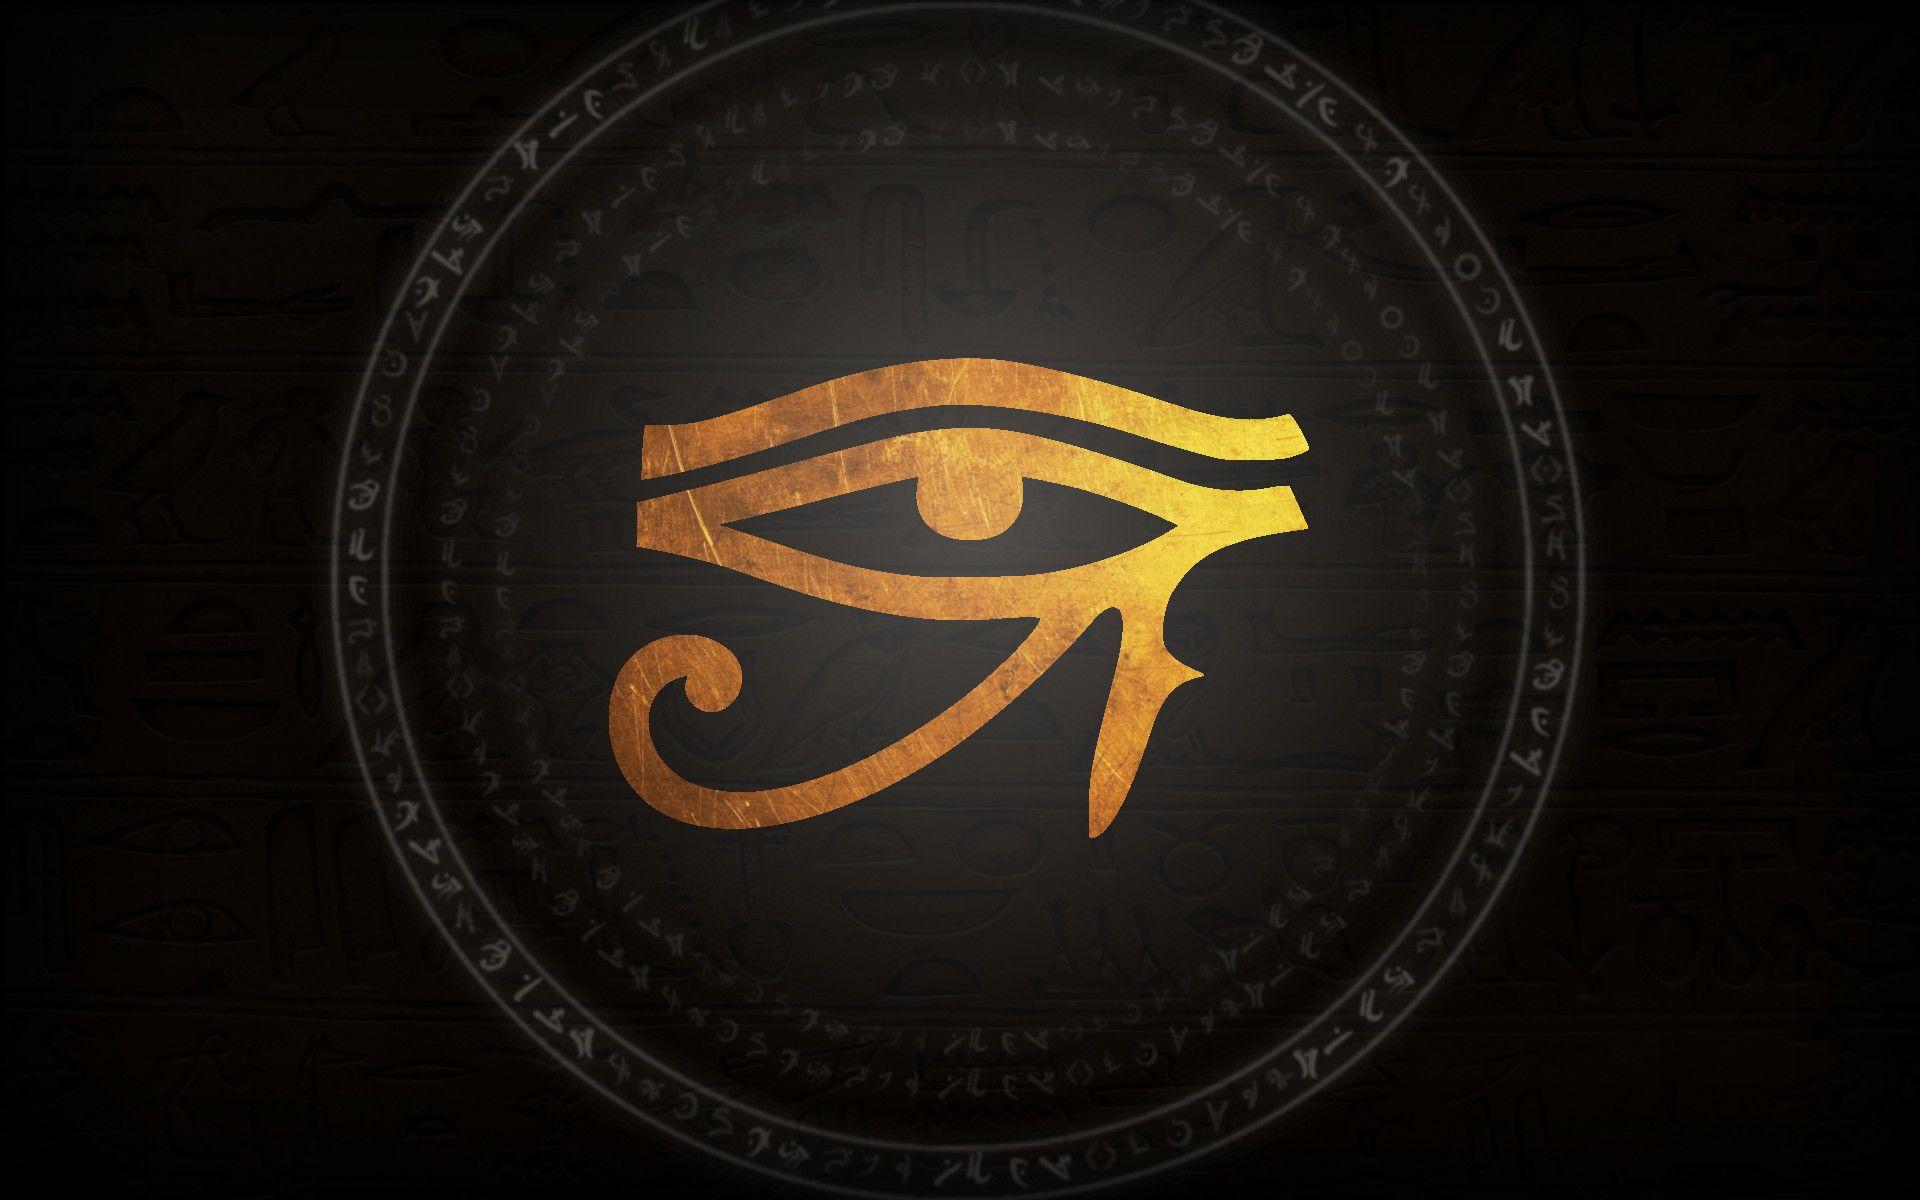 1920x1200 Full Full Hd Eye Of Horus Wallpapers D Screens Wallpapers Ancient Egyptian Deities Eye Of Ra Egyptian Deity